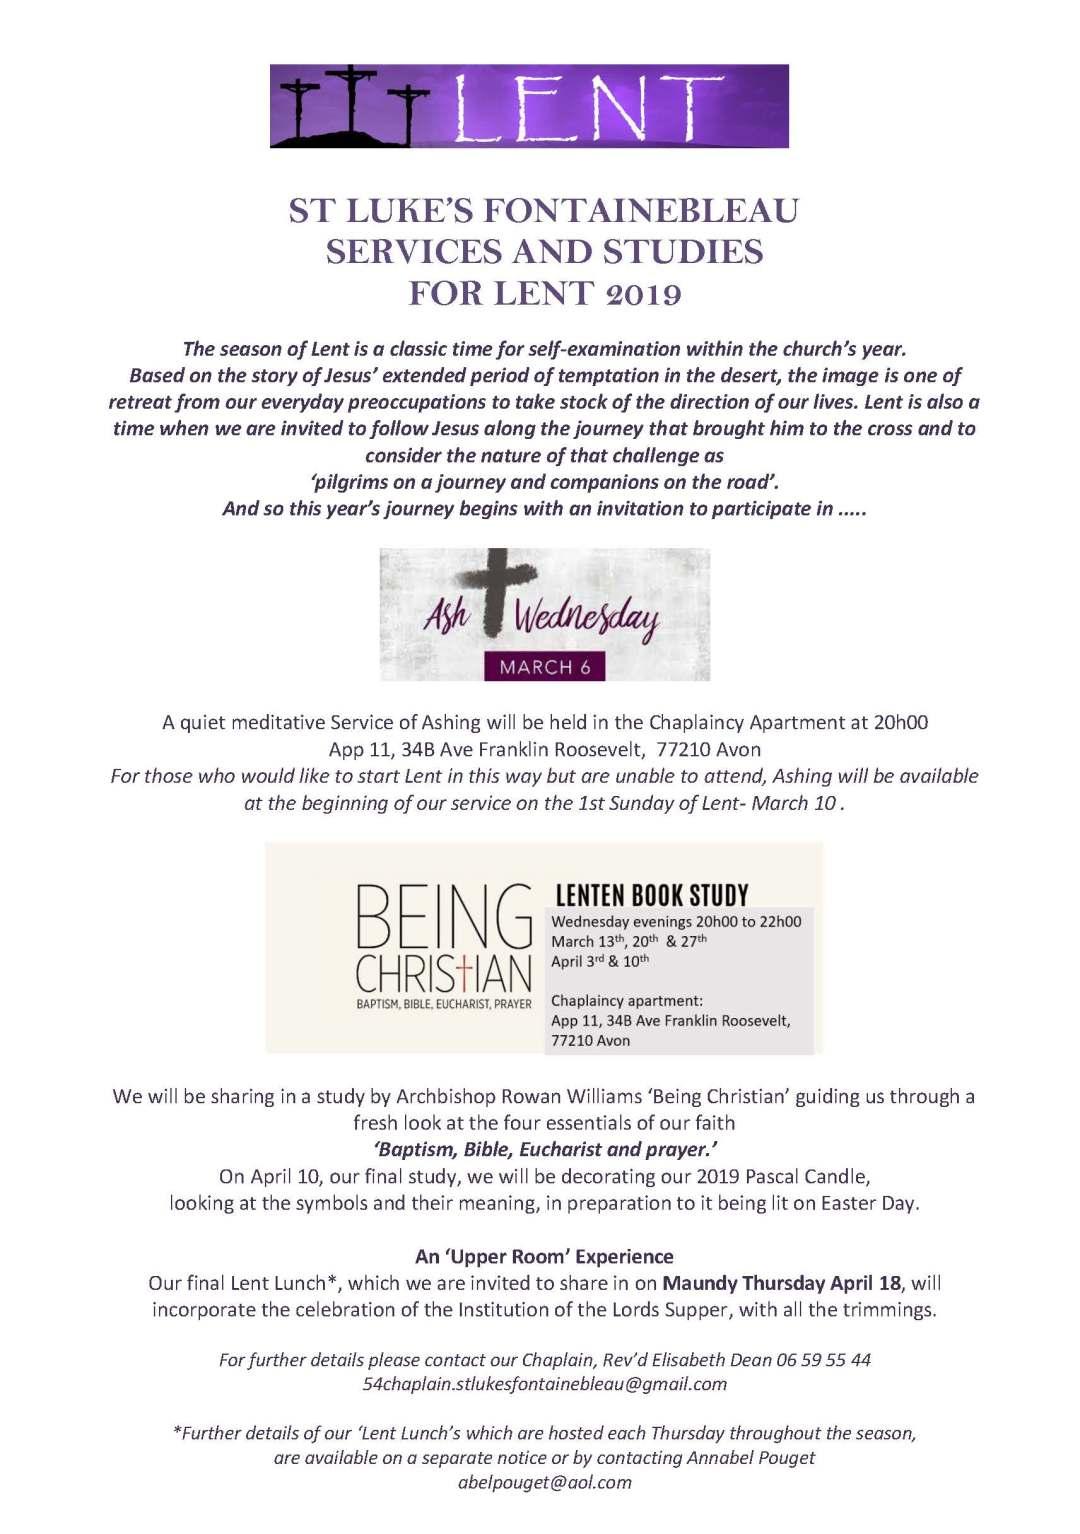 SERVICES AND STUDIES LENT 2019 (2)